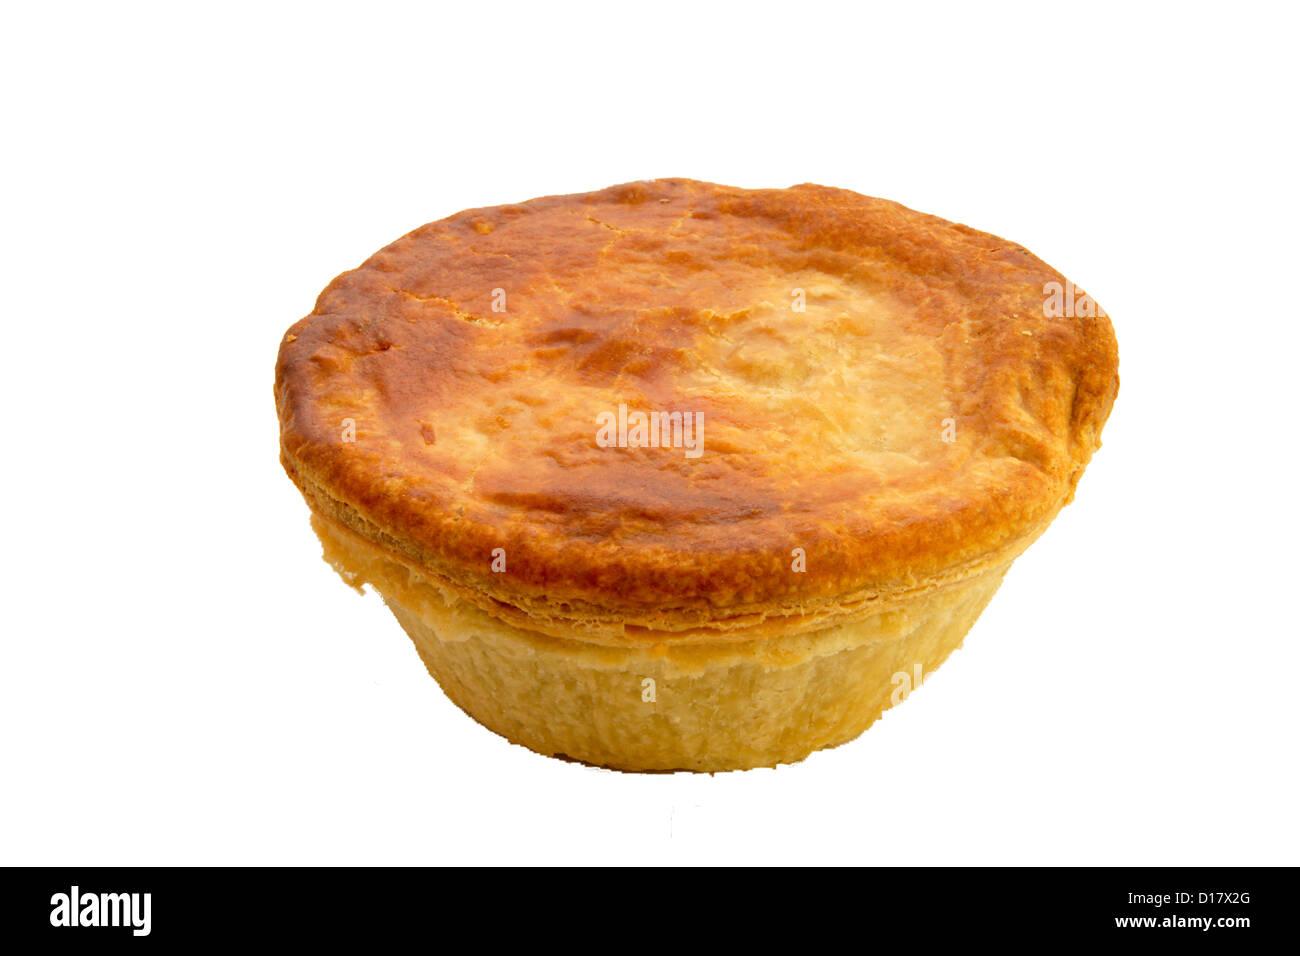 Pie - Stock Image